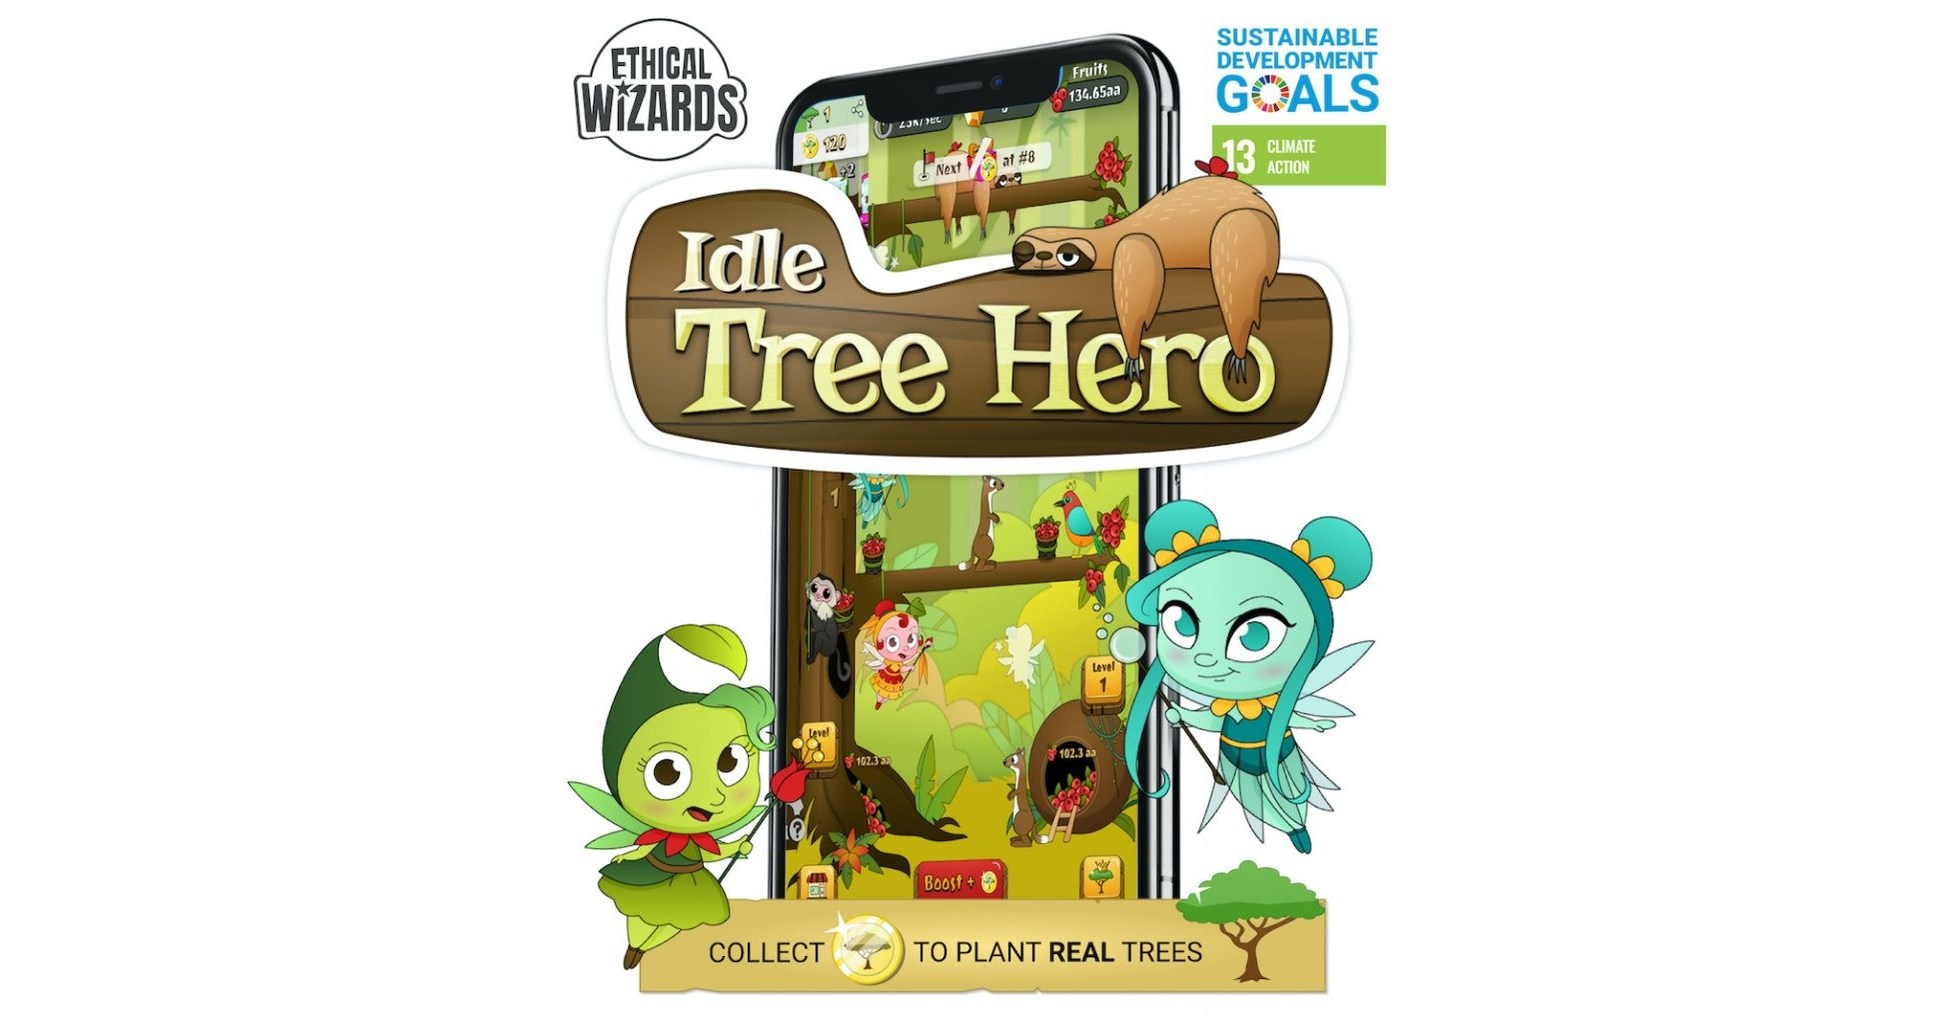 Idle Tree Hero Ethical Wizards jpg?p=facebook.